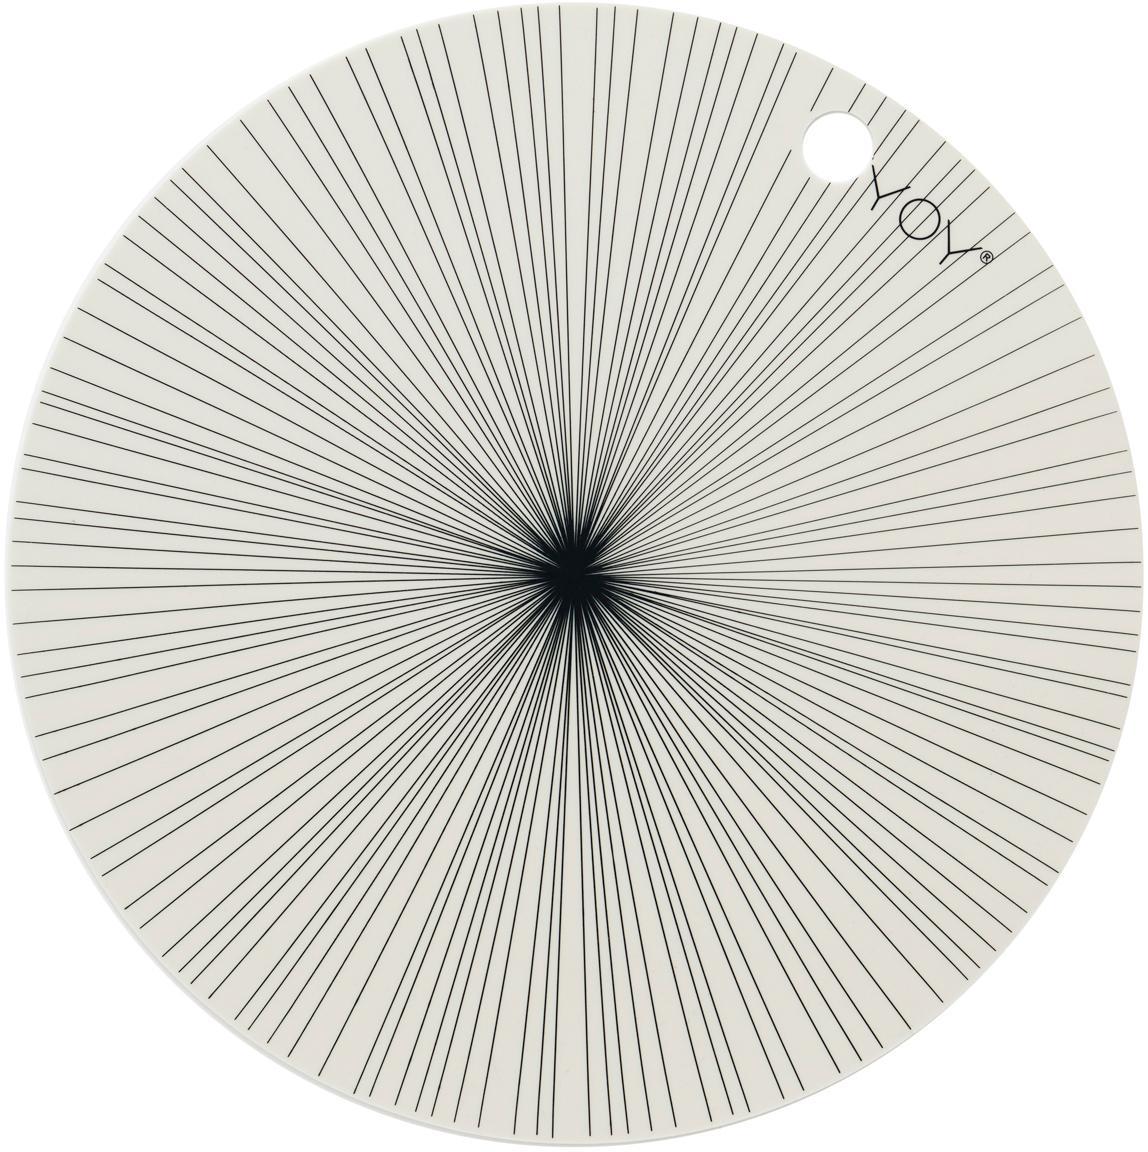 Manteles individuales redondos Ray, 2uds., Silicona, Blanco crudo, negro, Ø 39 cm